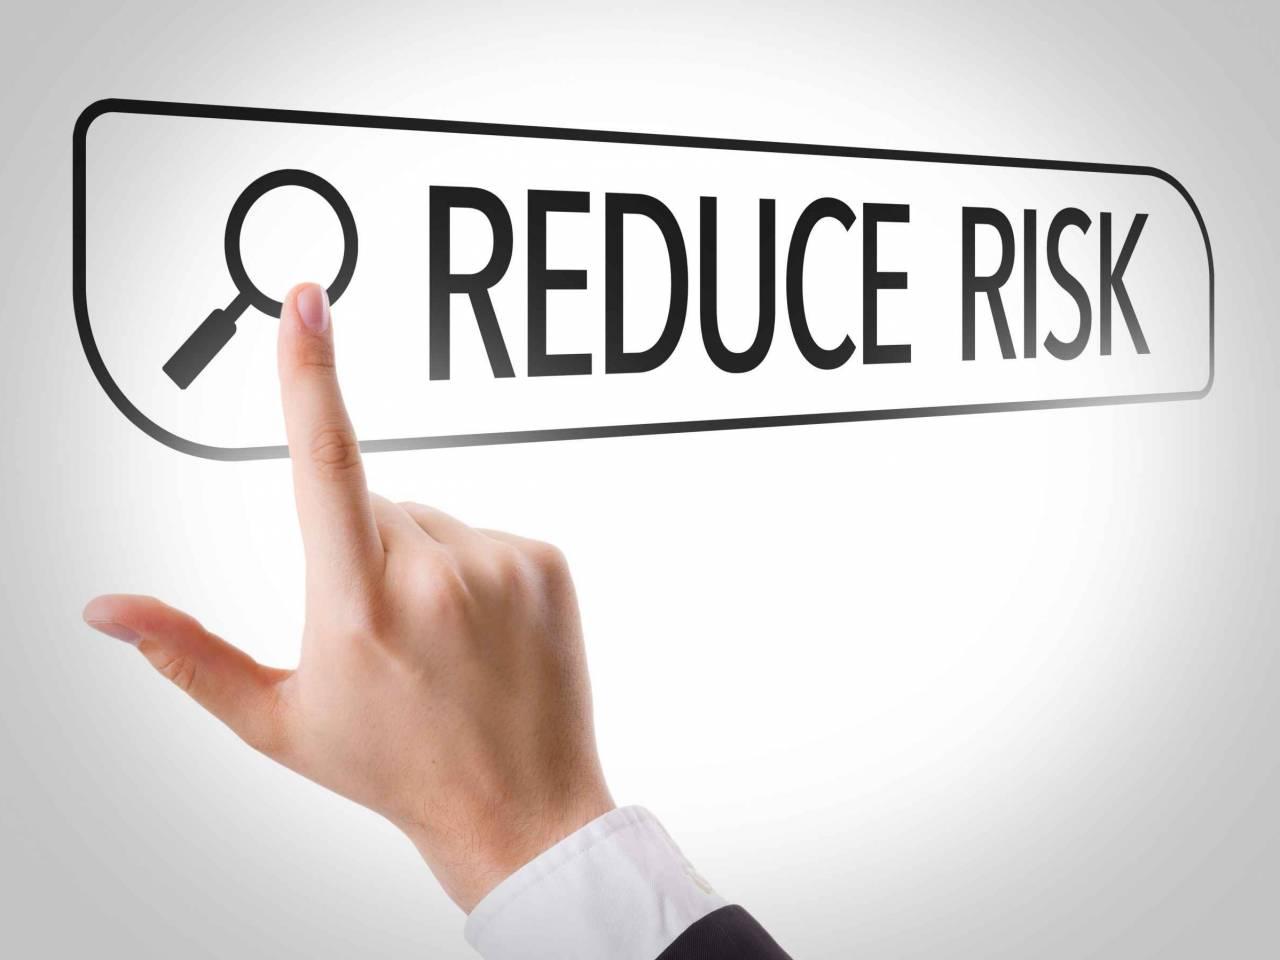 Reduce Risk written in search bar on virtual screen